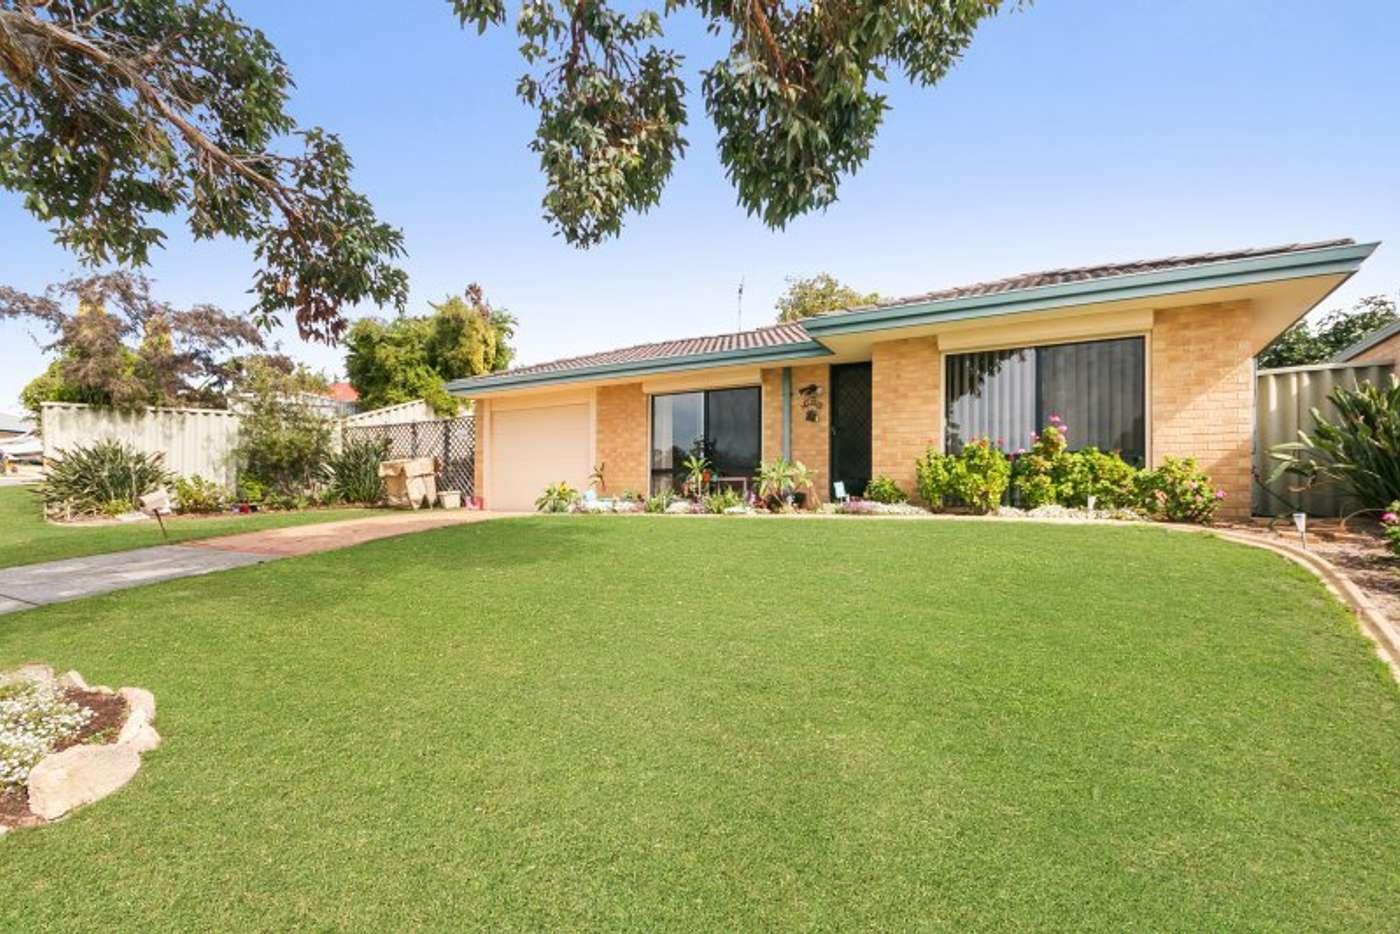 Main view of Homely house listing, 3 Ranunculus Court, Beeliar WA 6164